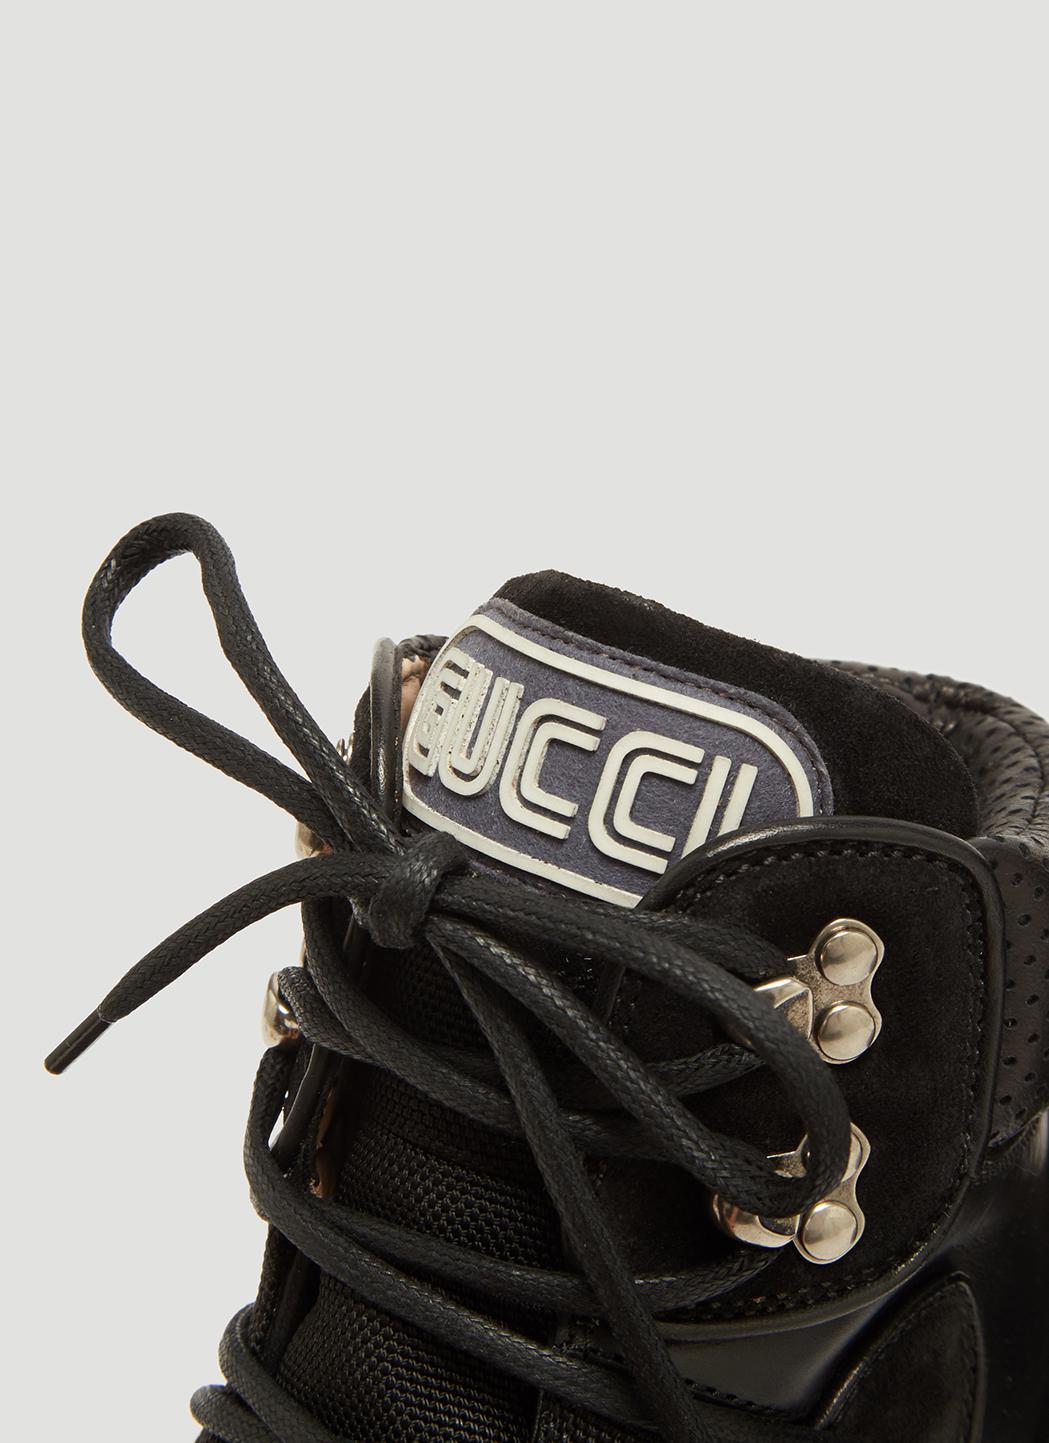 Lyst Gucci Flashtrek High Top Sneaker In Black Save Flash  Olivia Sneakers View Fullscreen